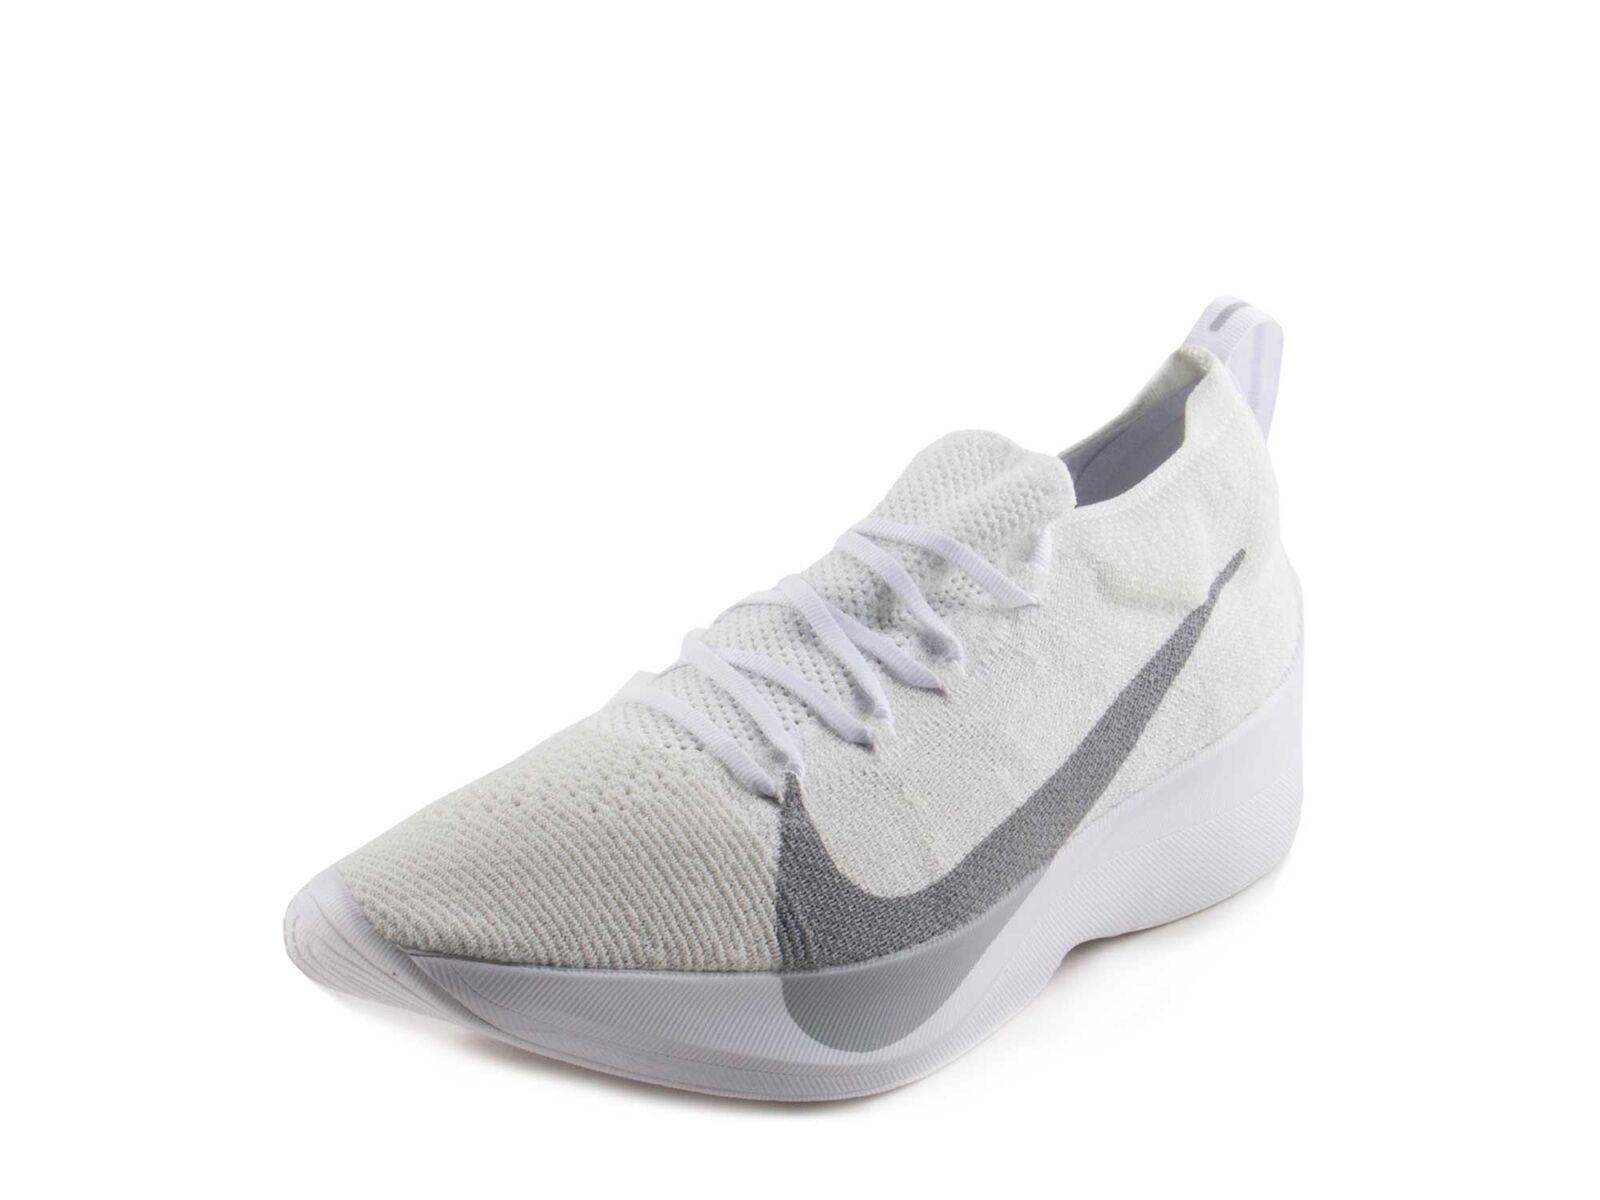 c469a0f1286cd6 Nike Vapor Street Flyknit Pure White wolf Grey Aq1763-100 Men Size ...